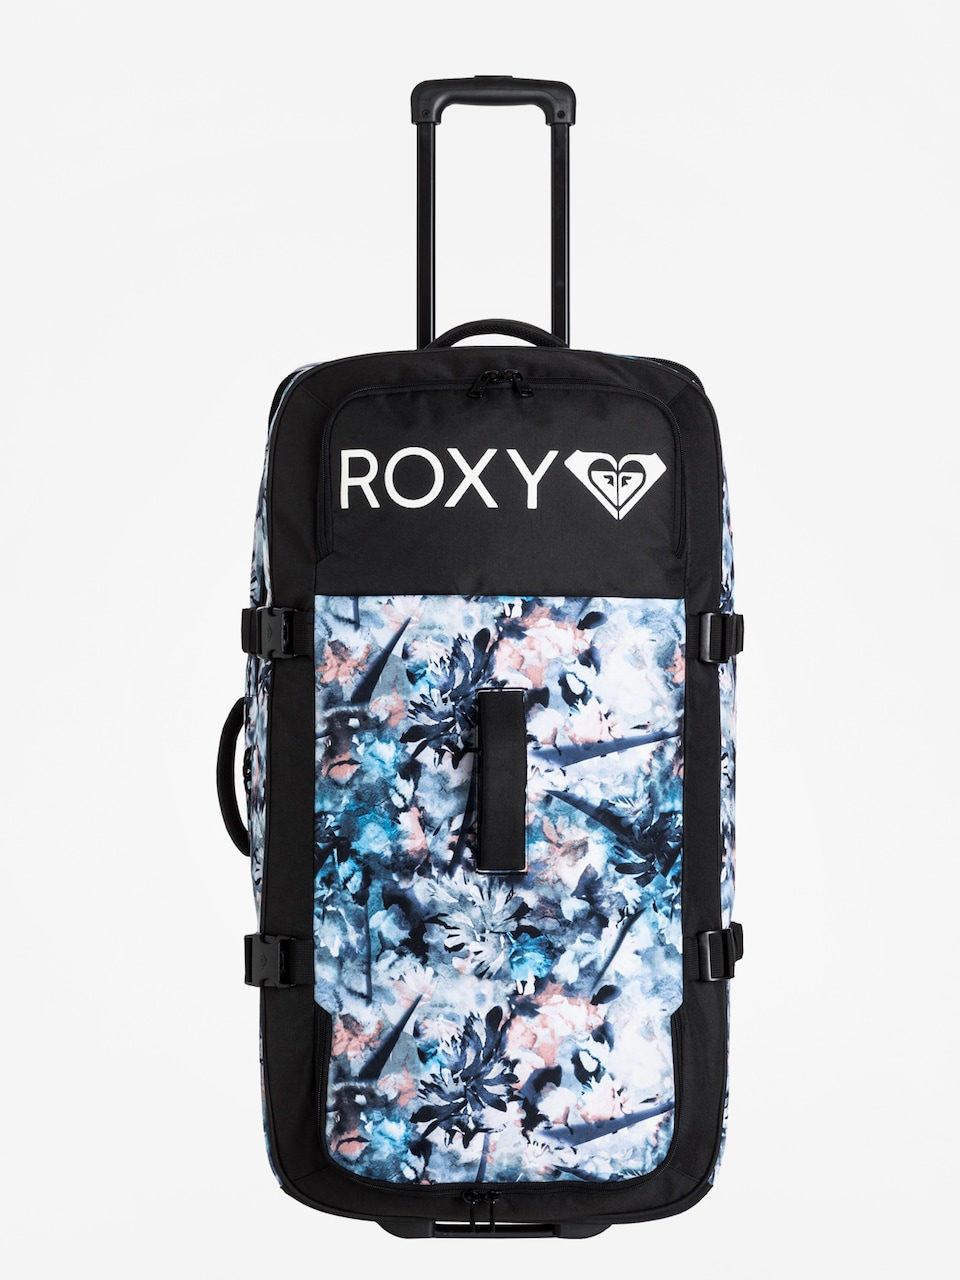 Roxy Suitcase Long Haul Travel Bag Wmn (water of love)